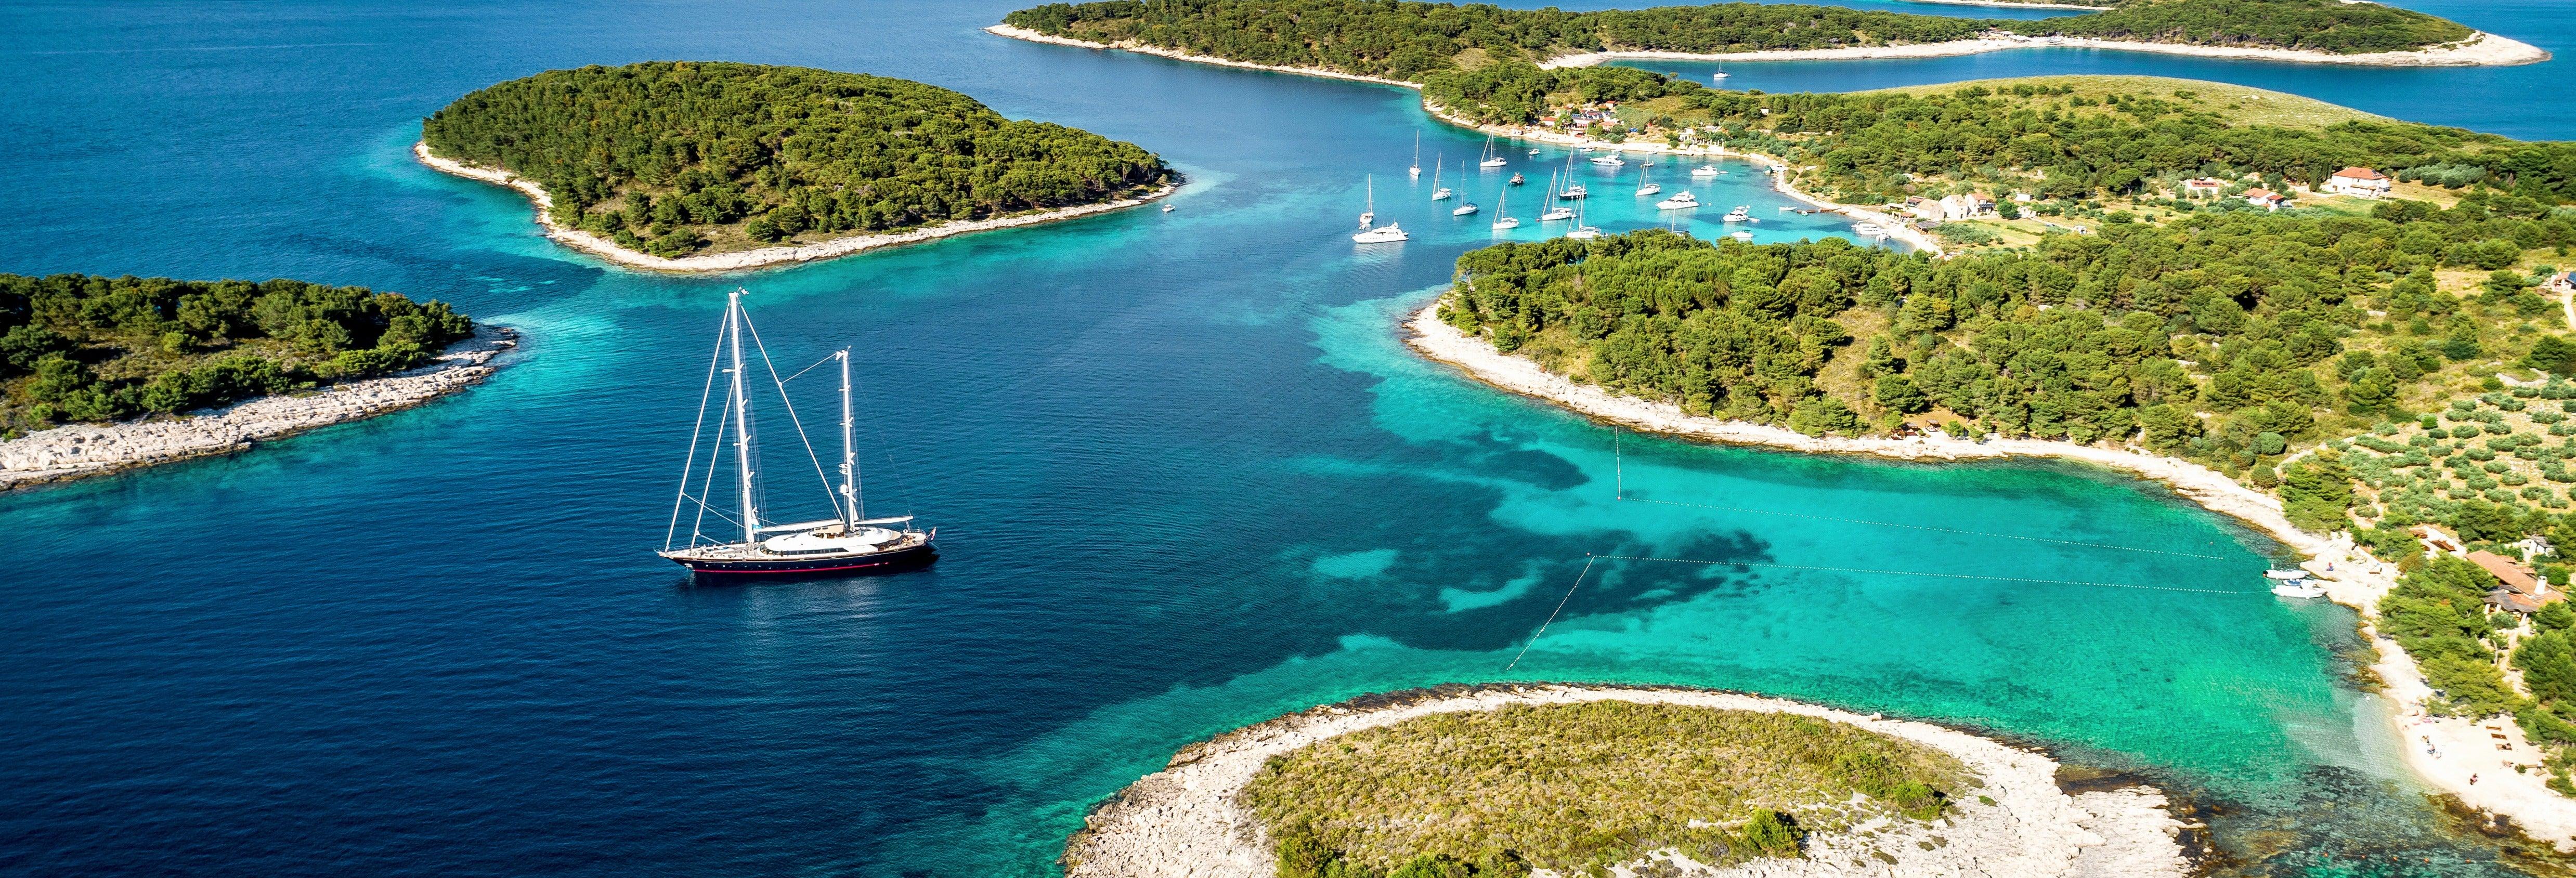 Crociera delle isole Spalmadori al tramonto